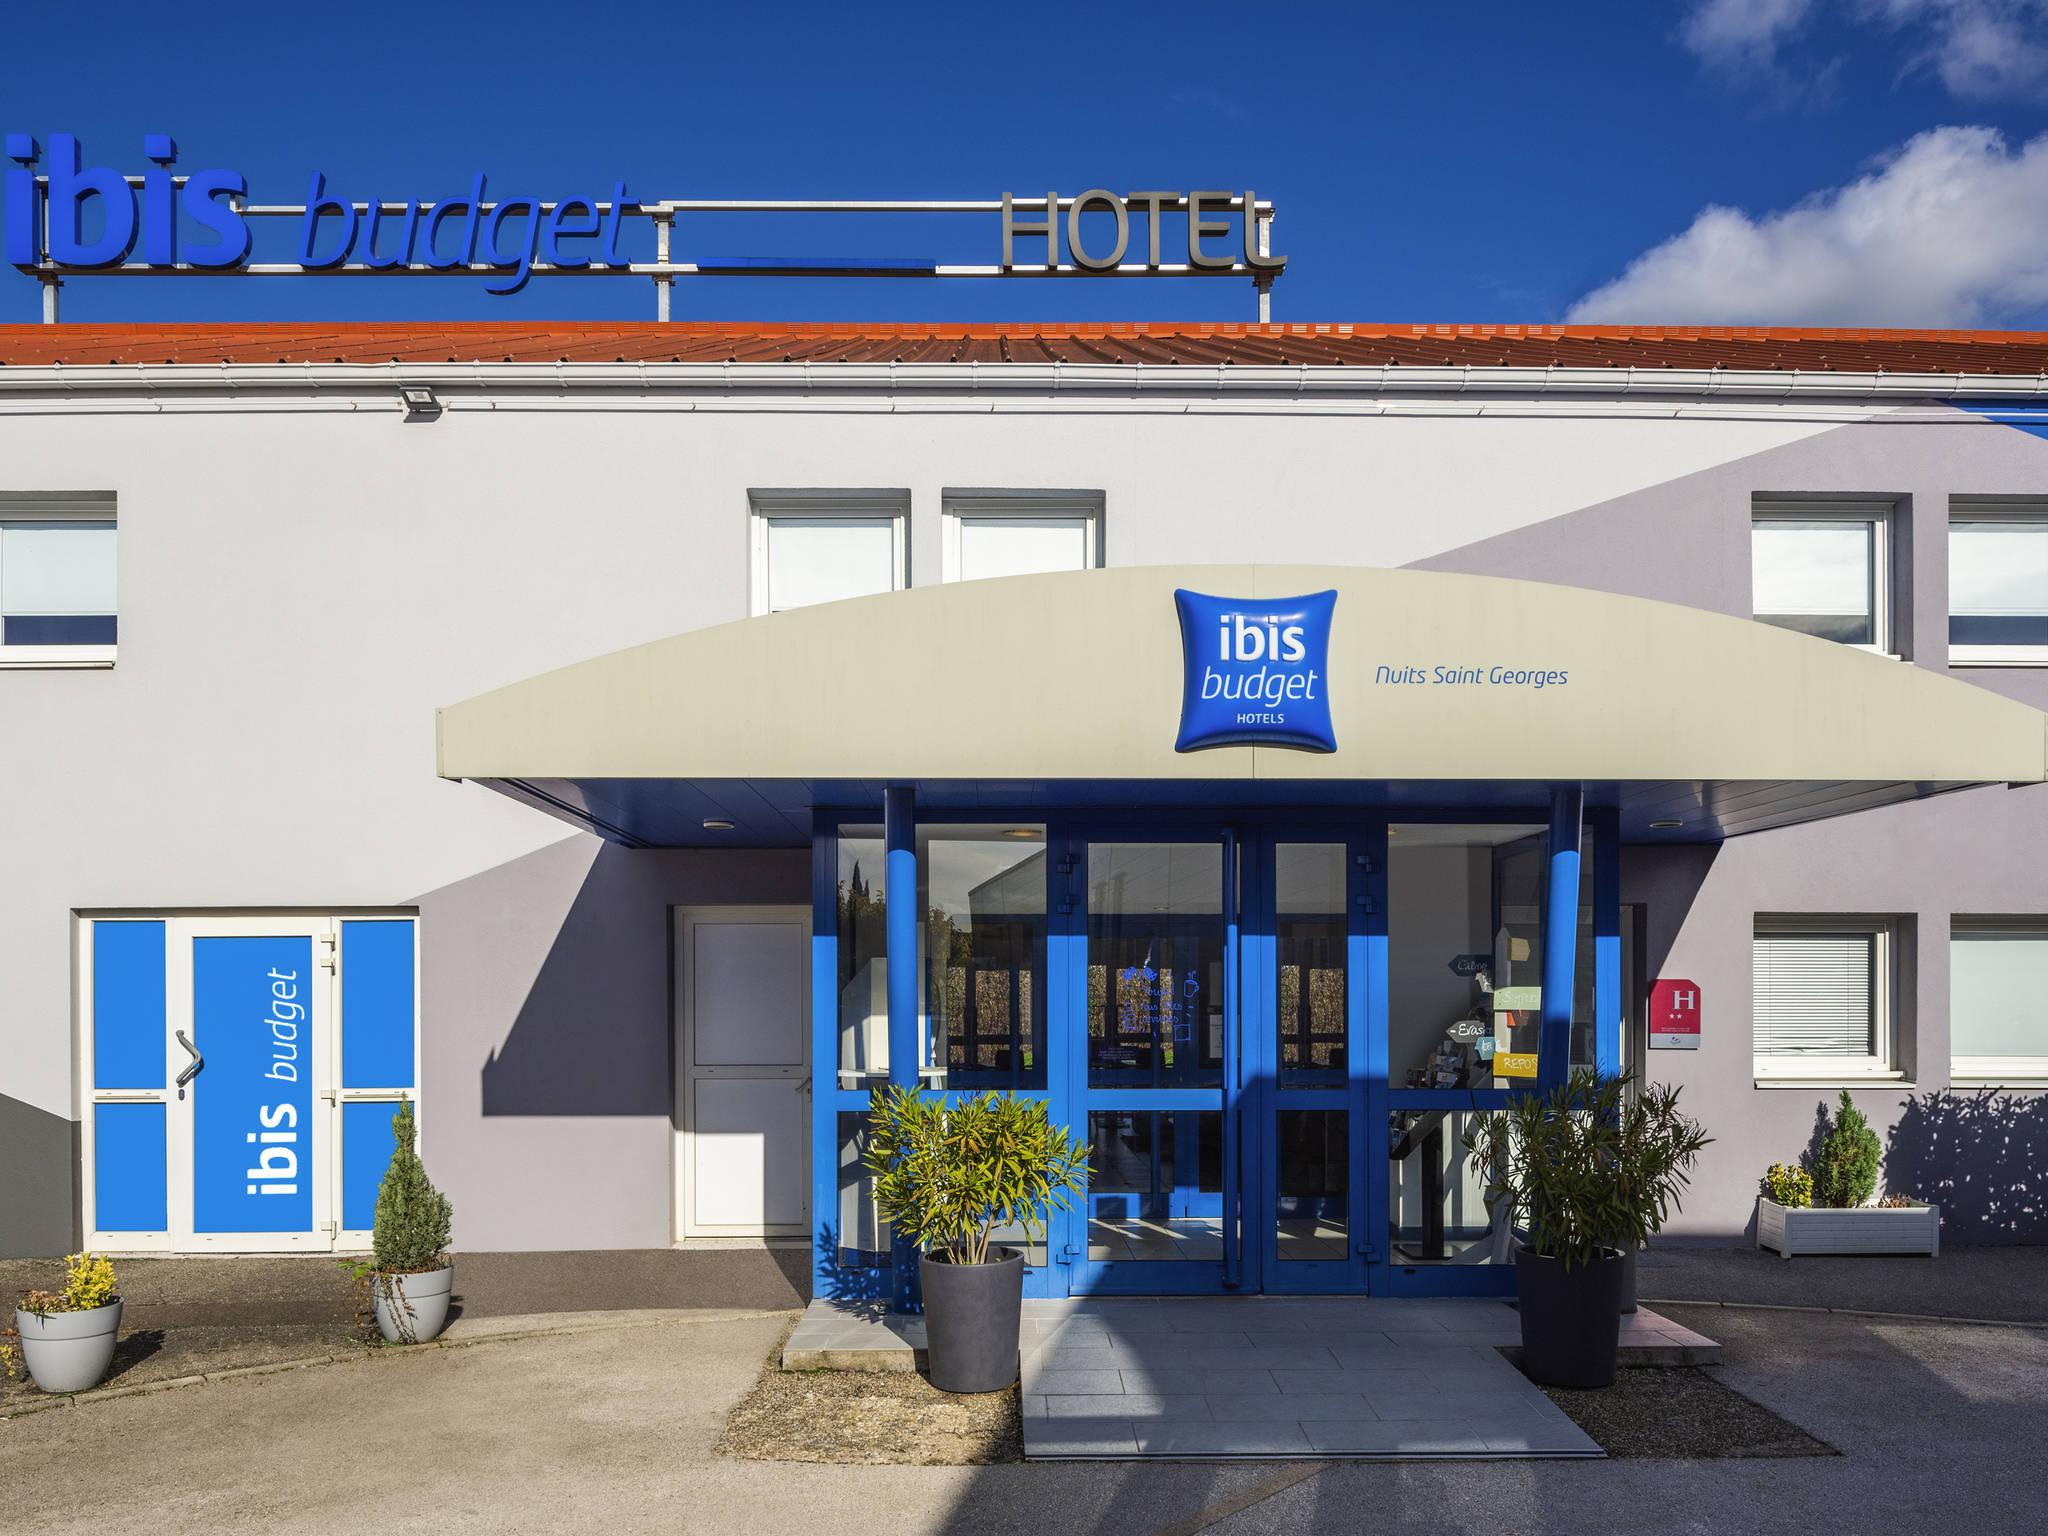 Hôtel - ibis budget Nuits-Saint-Georges